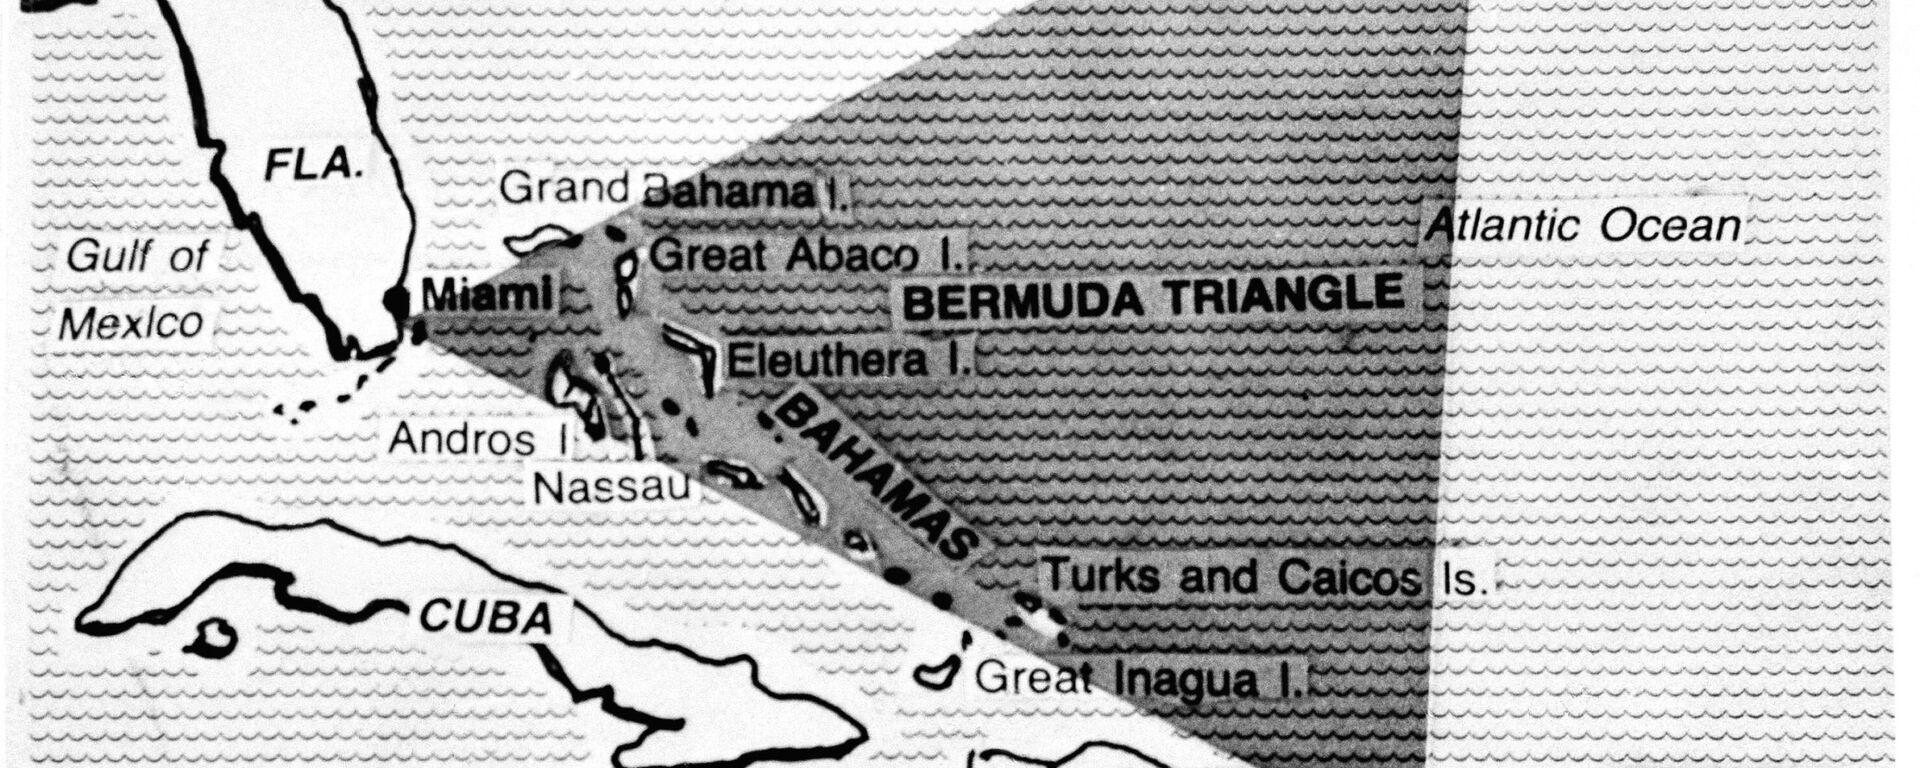 Бермудский треугольник на карте - Sputnik Italia, 1920, 05.12.2020